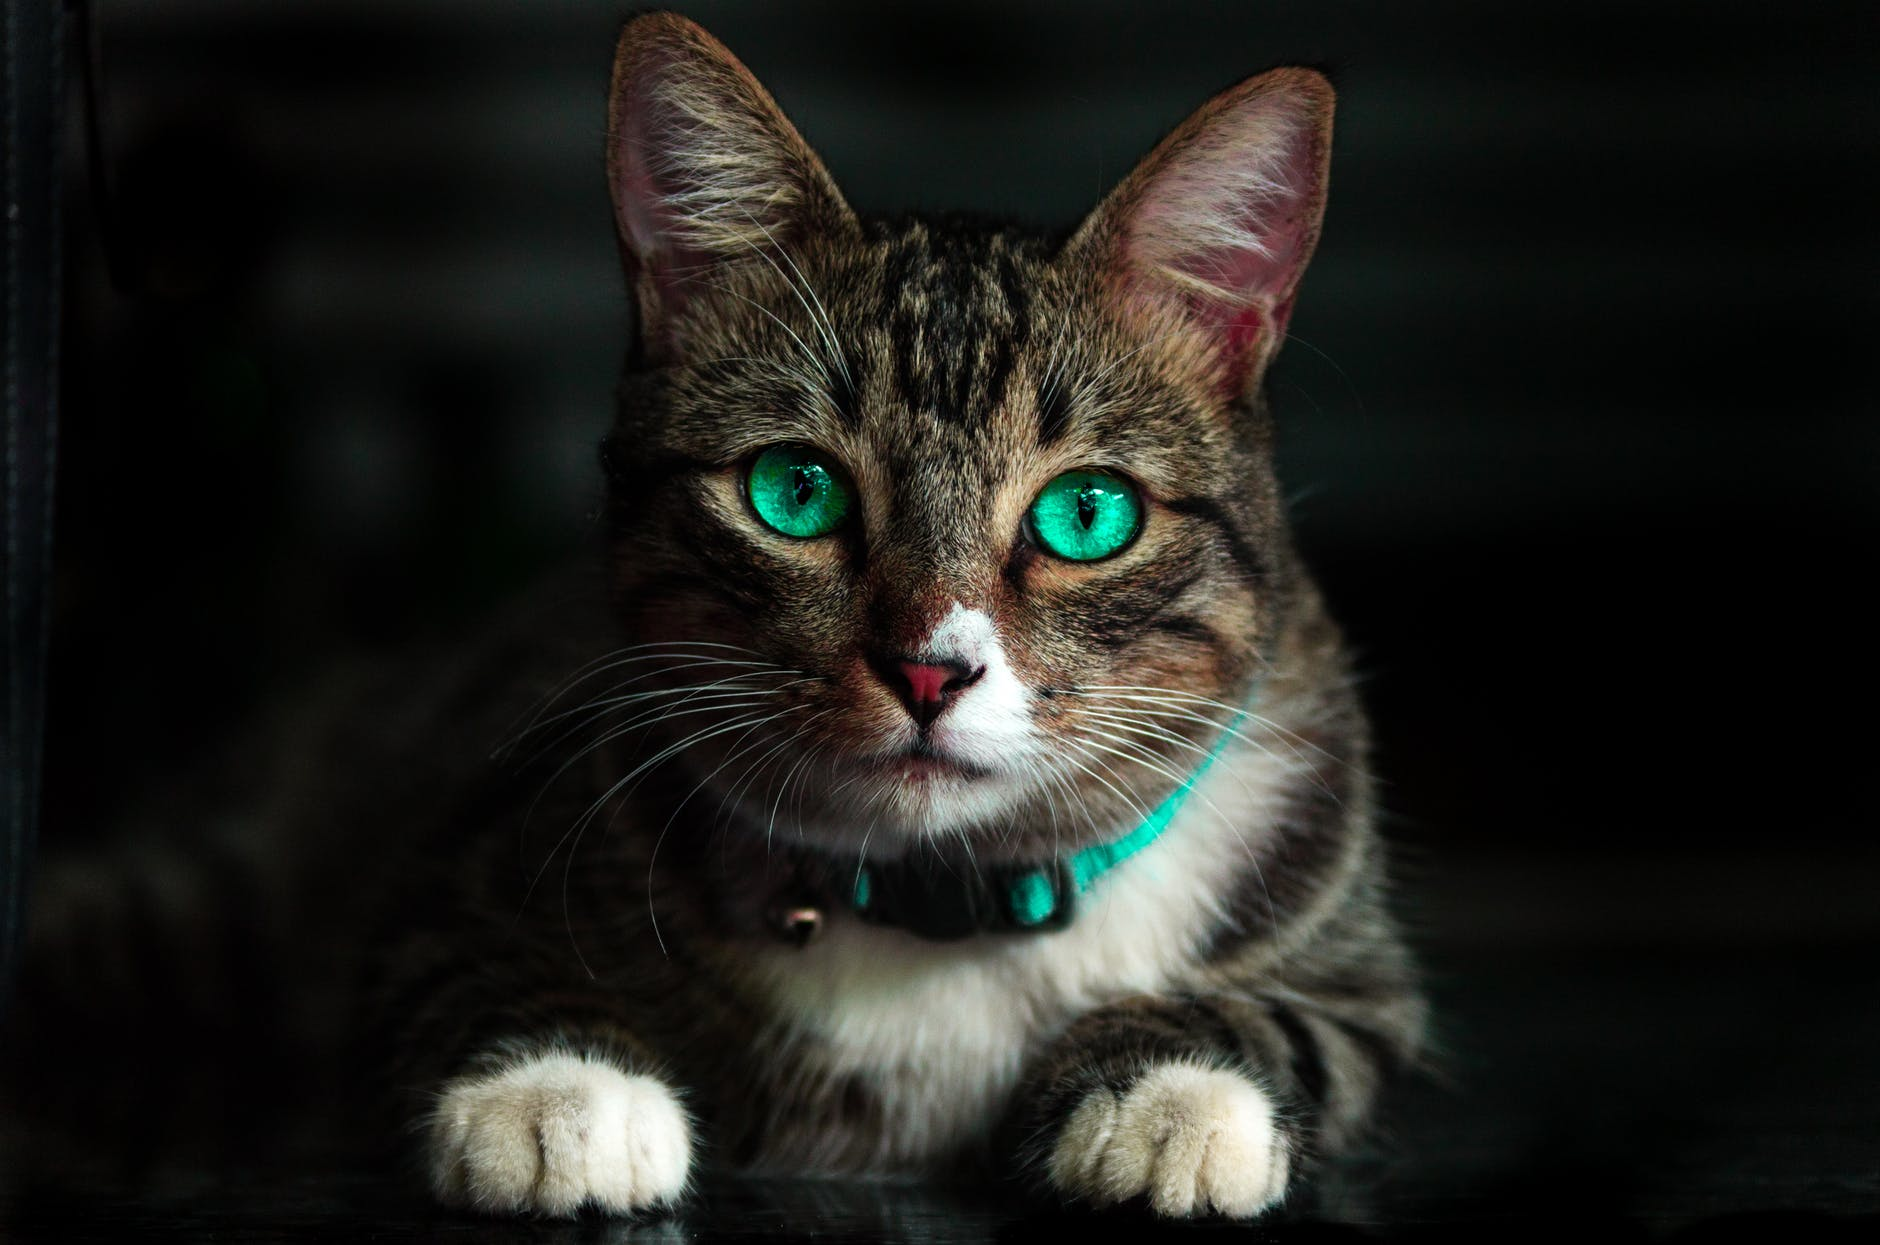 adorable animal blur cat